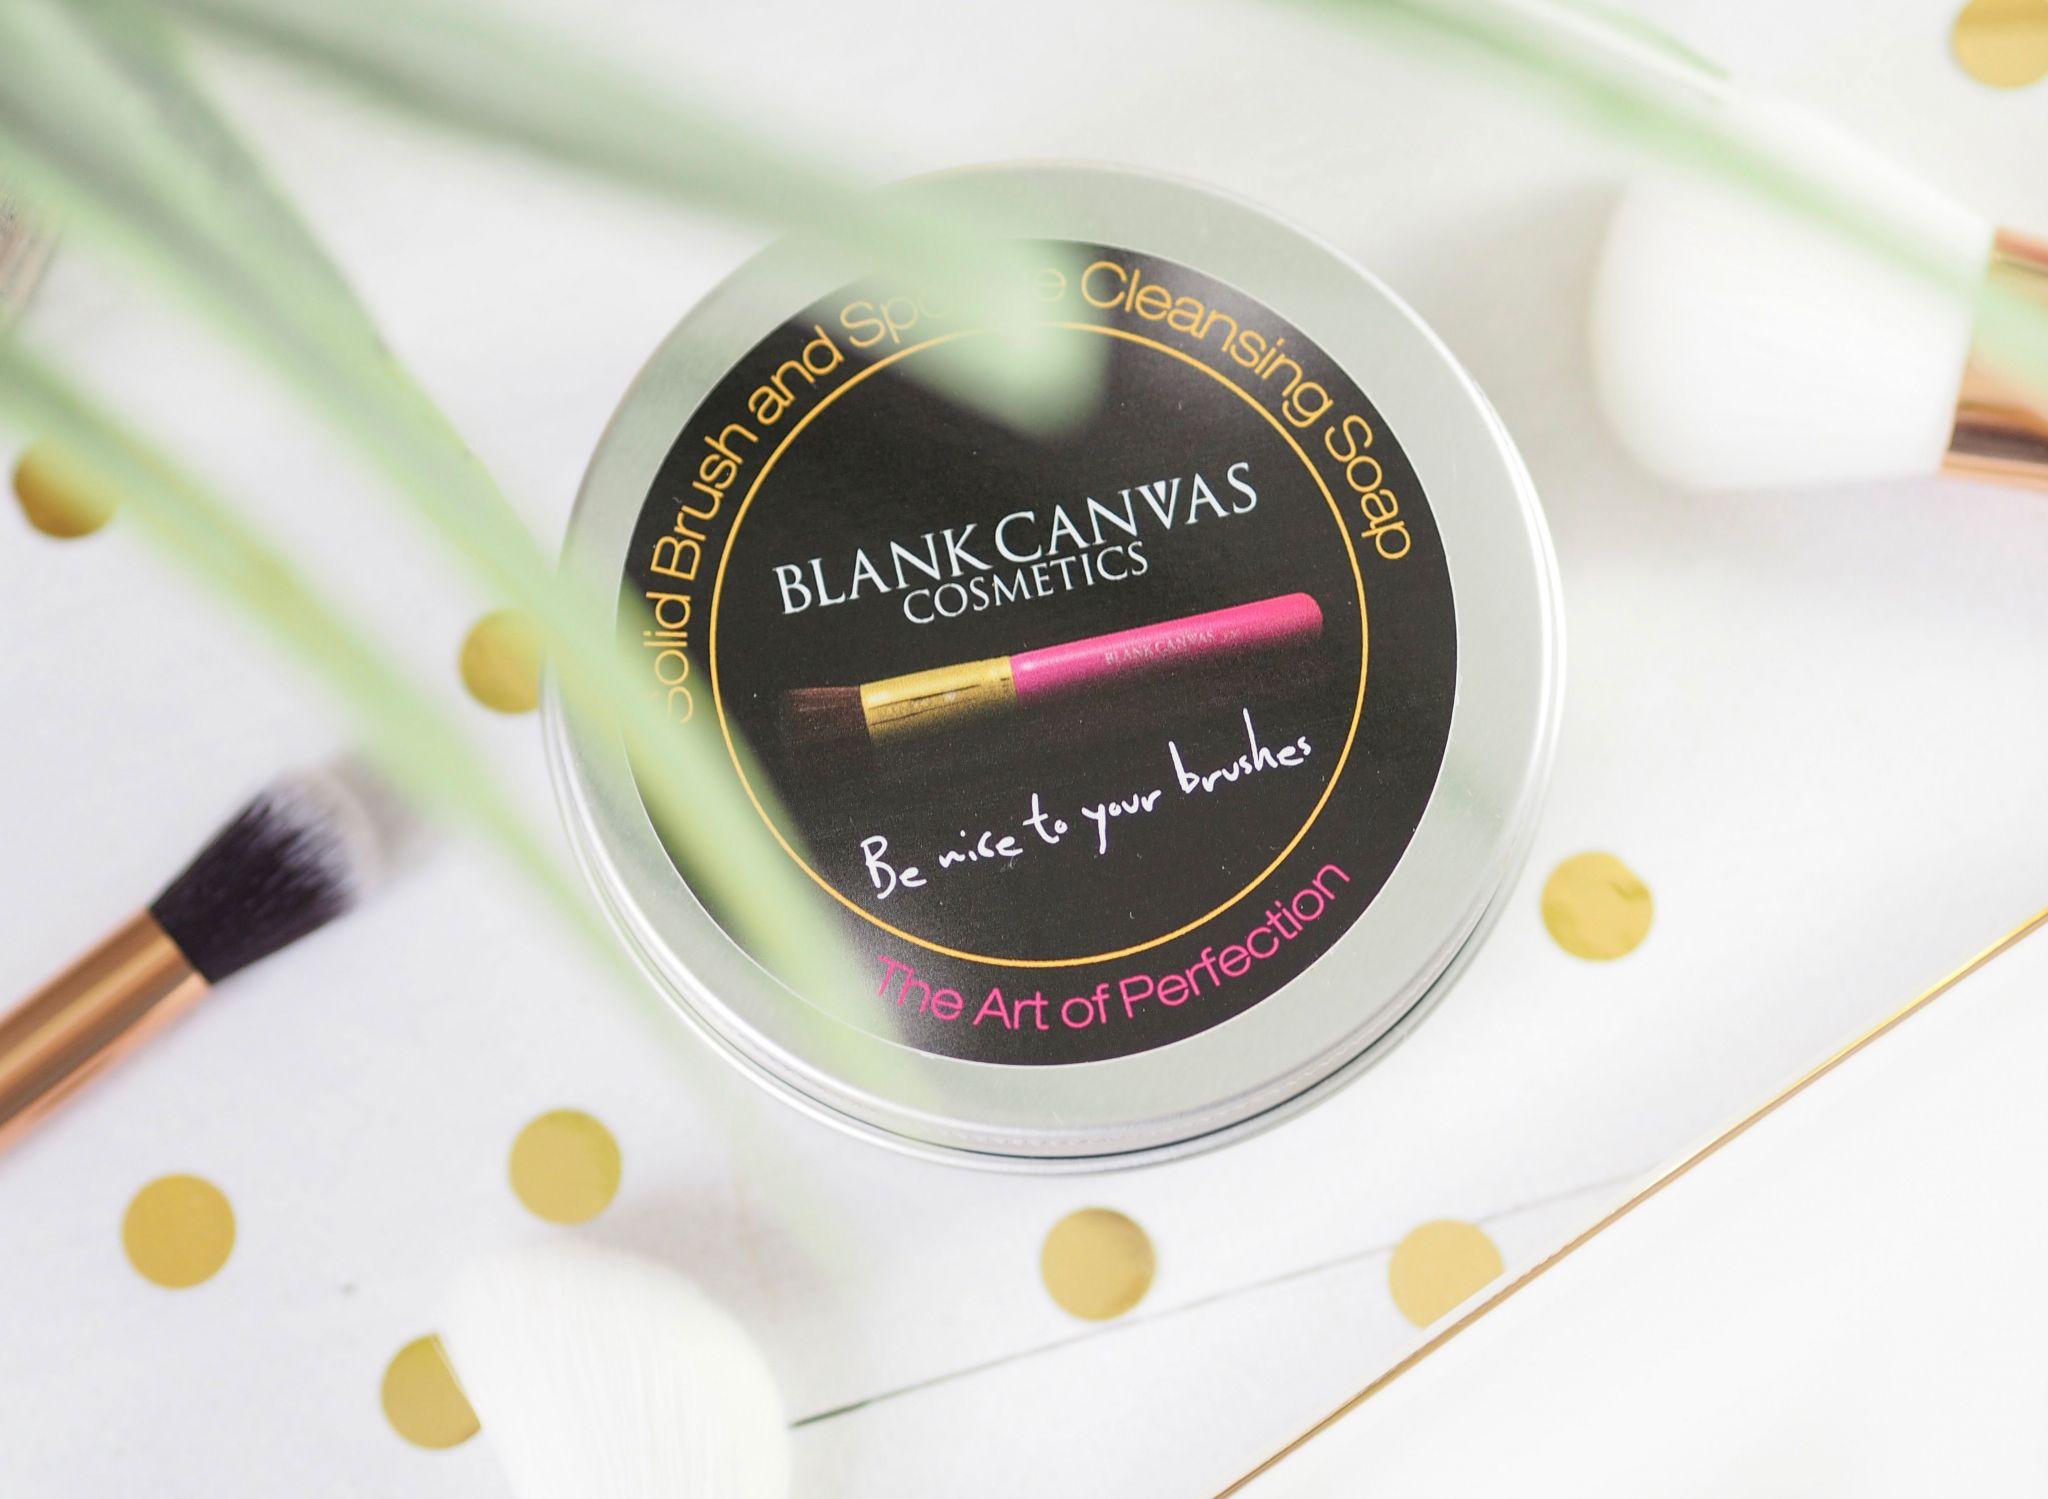 Blank Canvas Solid Brush & Sponge Soap